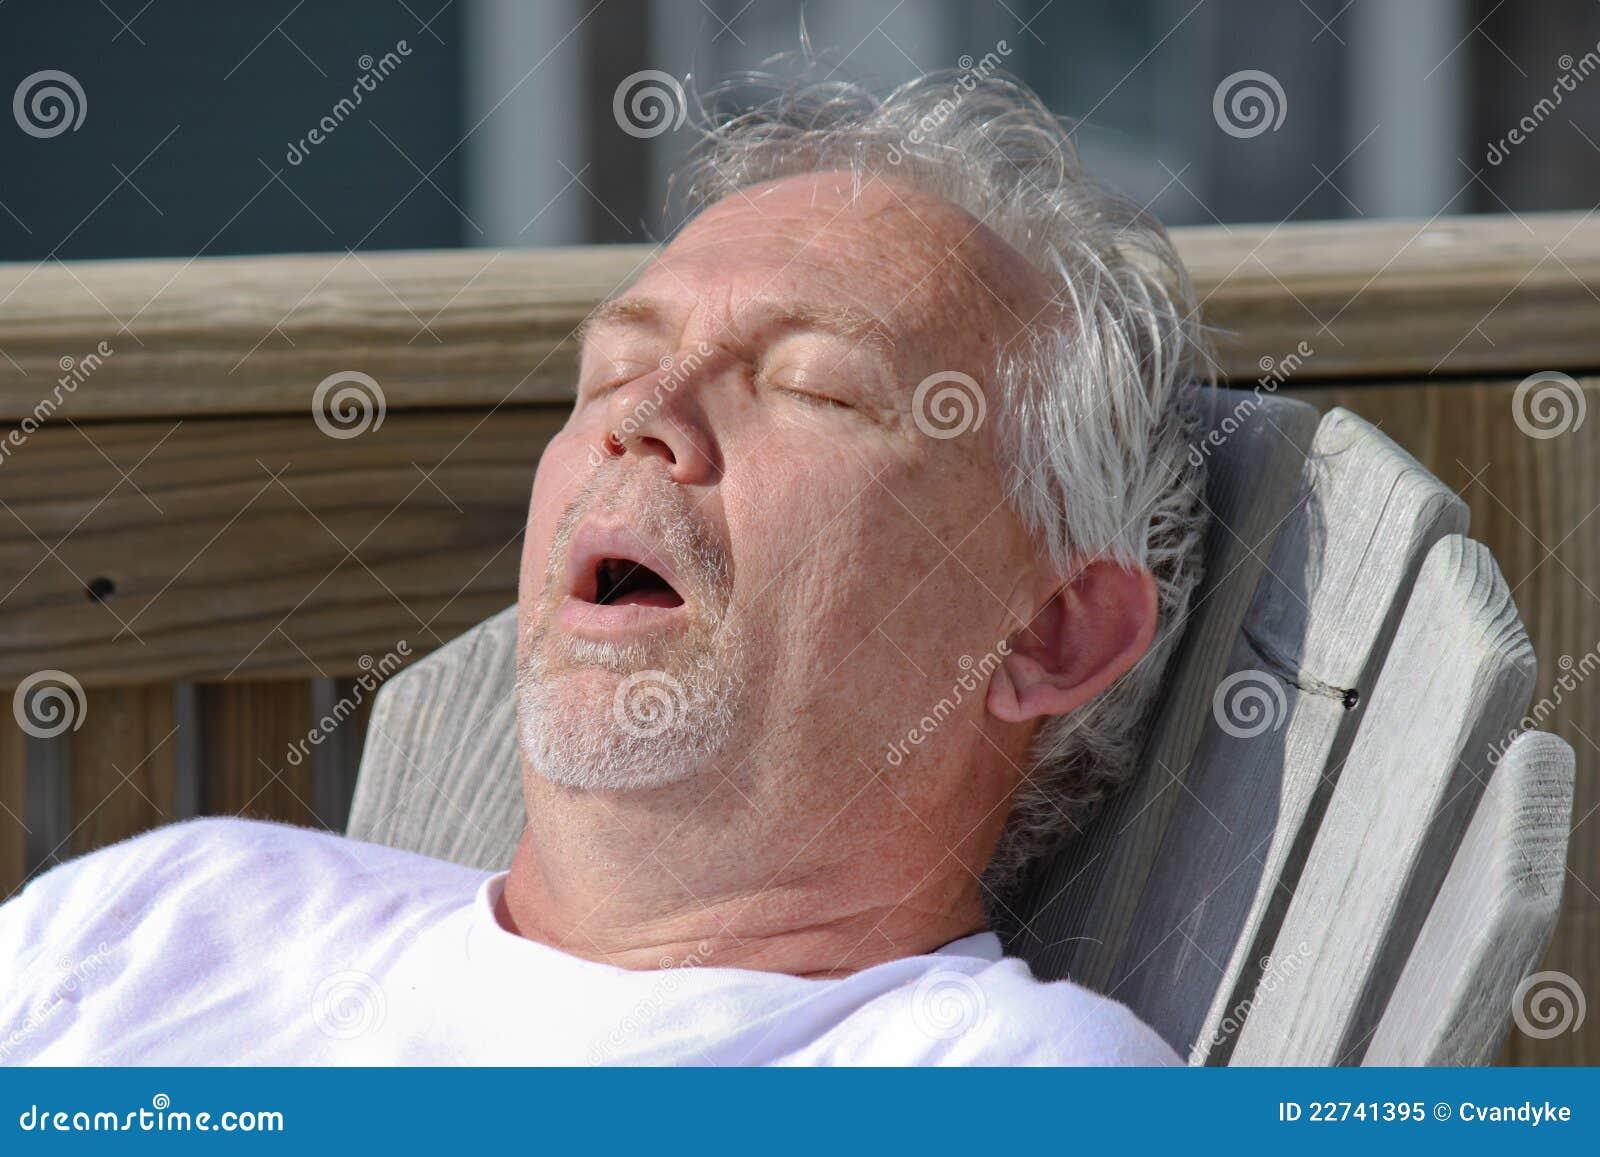 Man Snoring Outdoor Nap